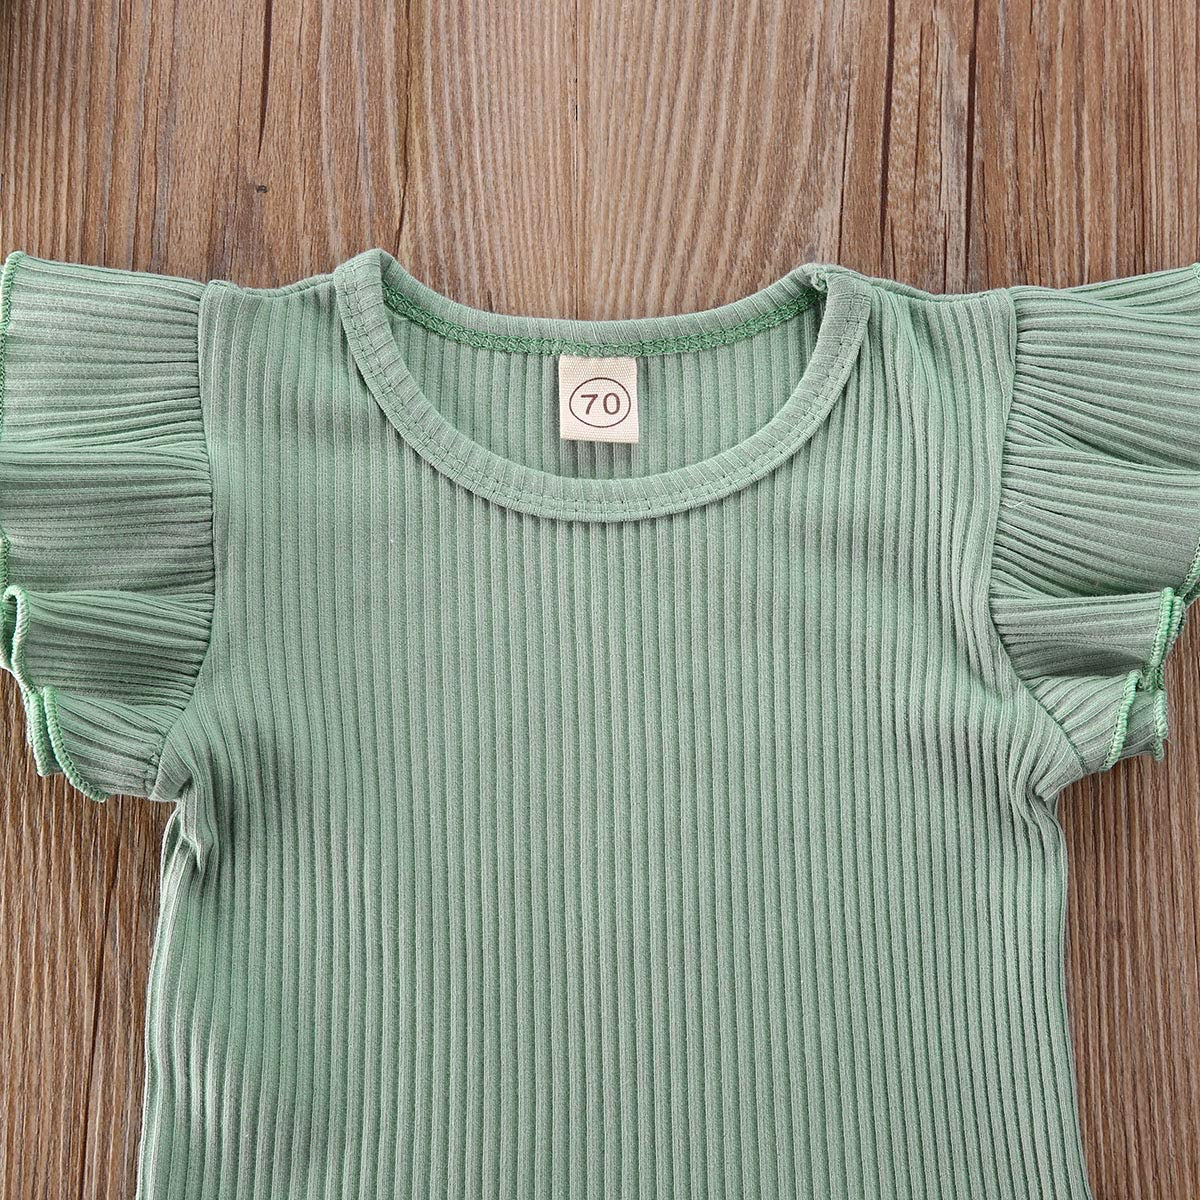 CADIAL Newborn Baby Girl Clothes Sleeveless Romper+Ruffles Short Pants+Headband 3Pcs Summer Shorts Outfit